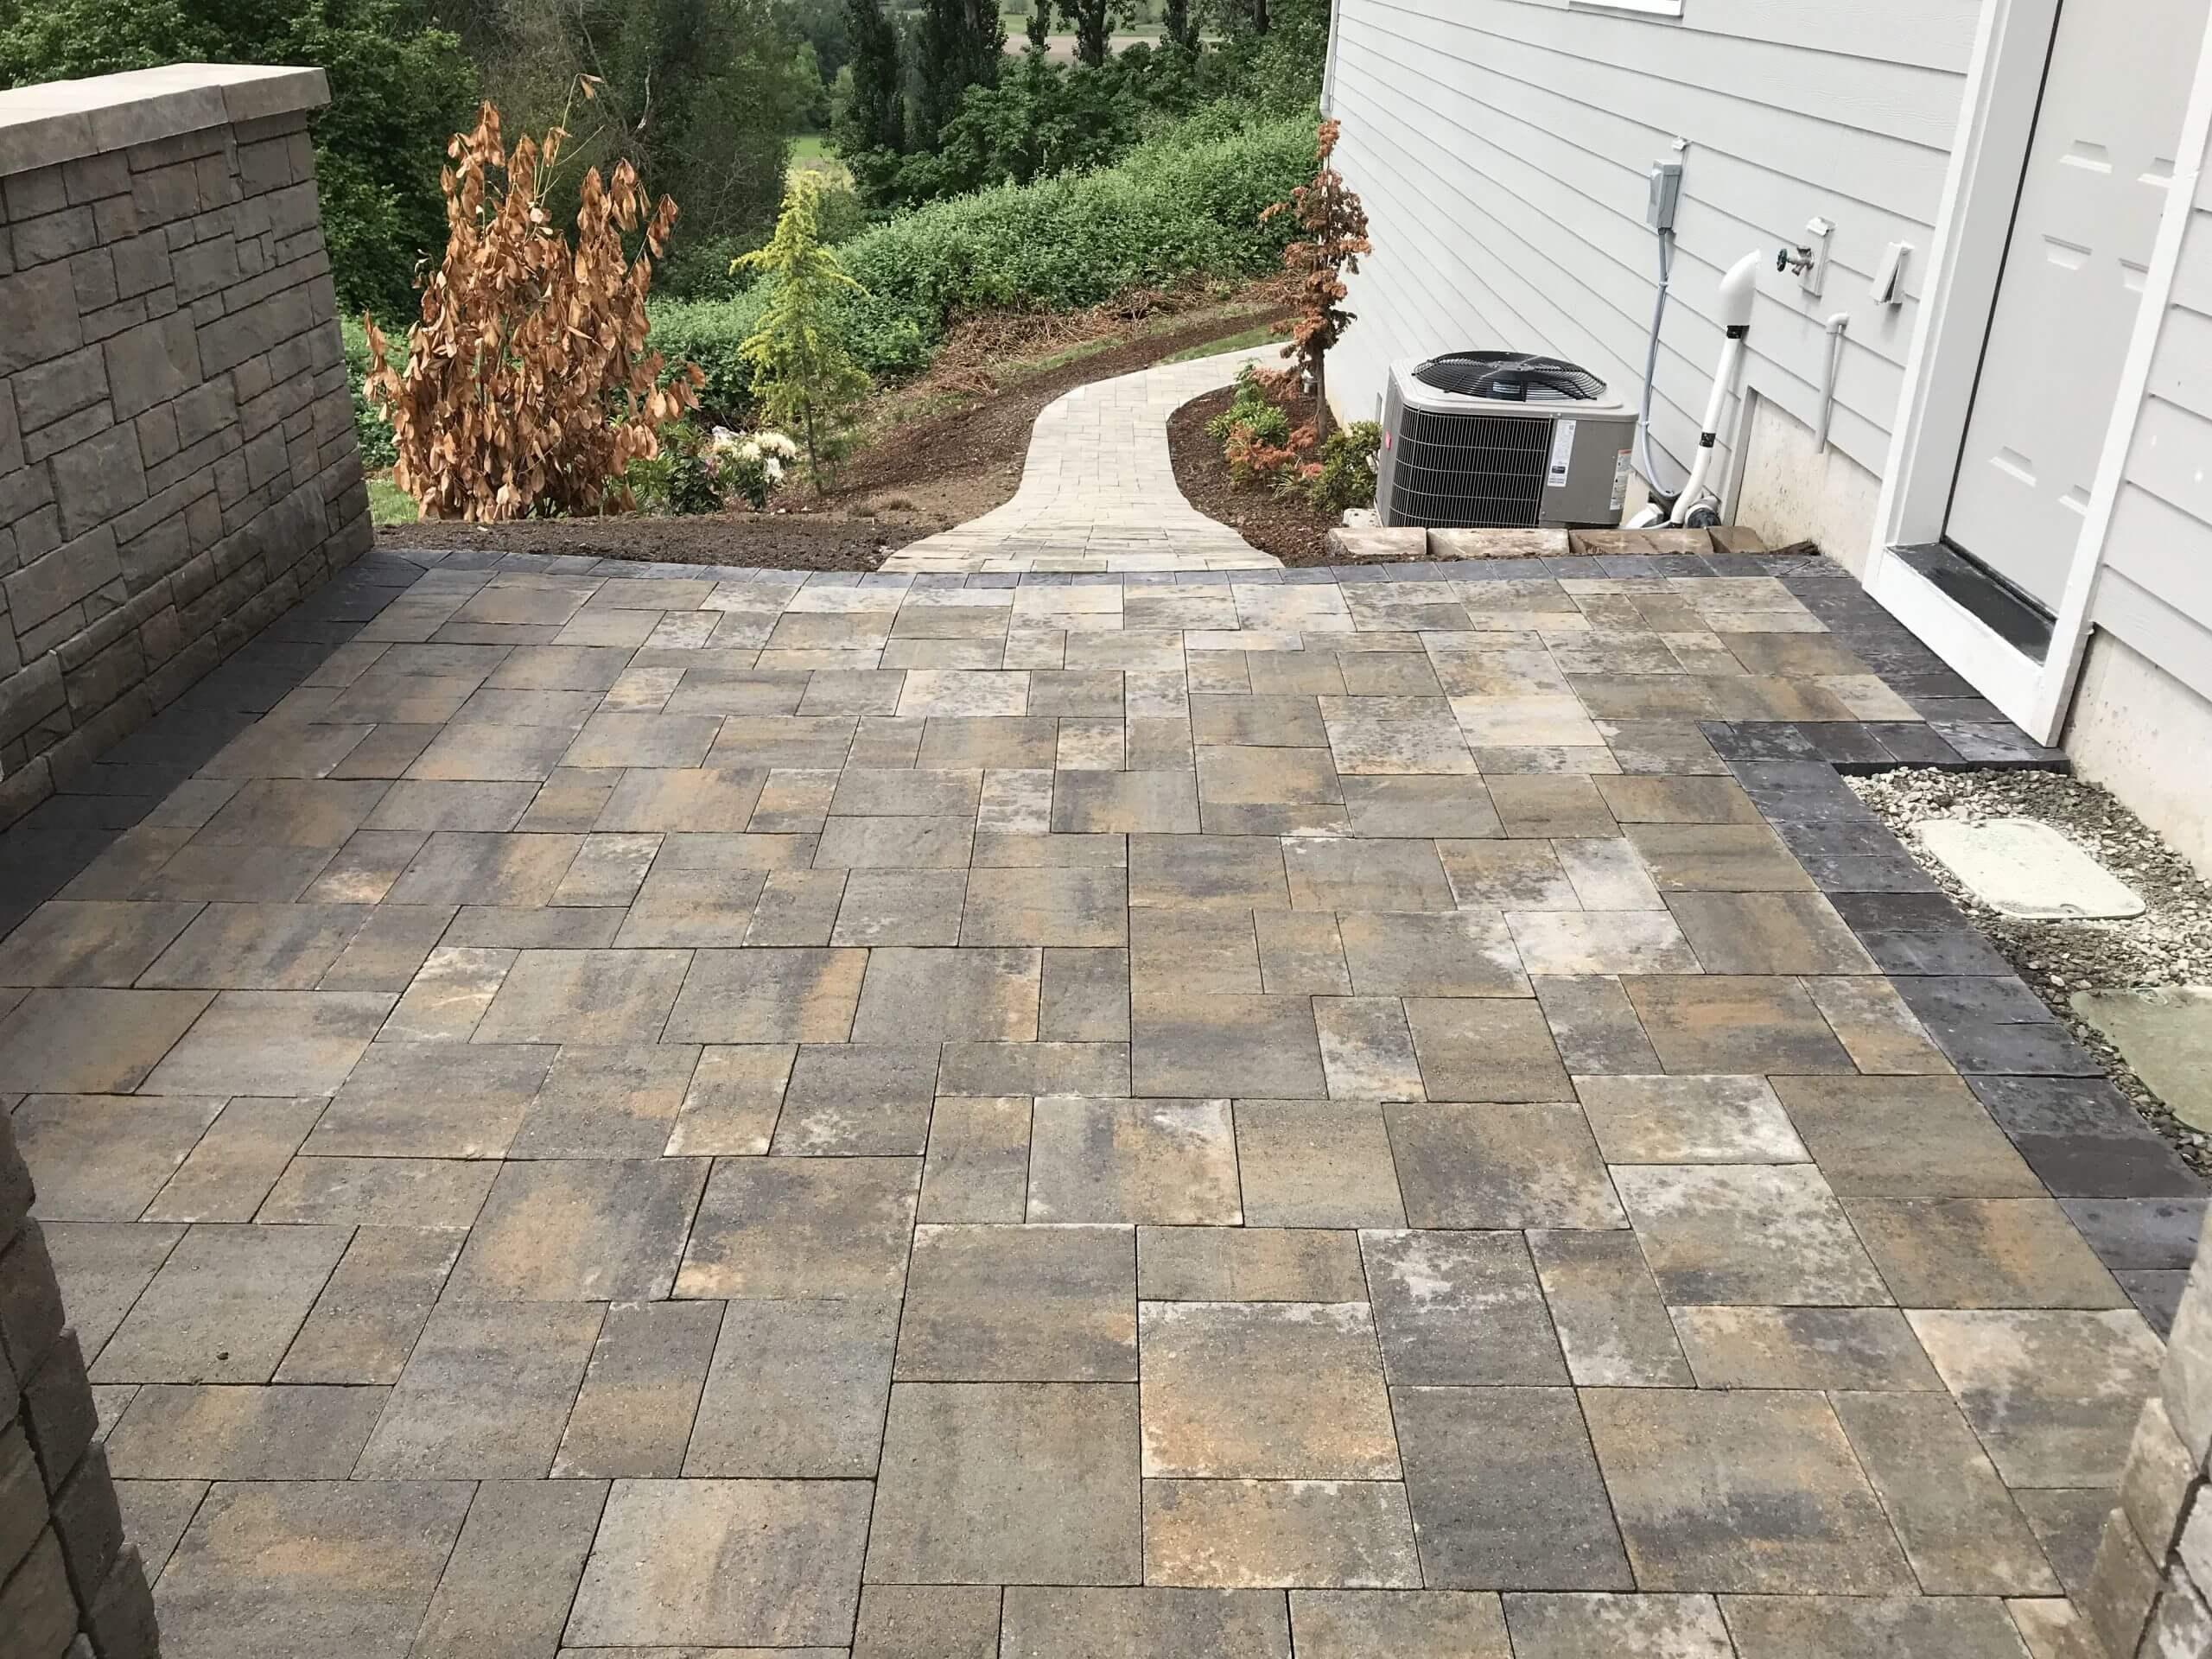 https://shovelandthumb.sfo3.digitaloceanspaces.com/patios walkways/patio 6